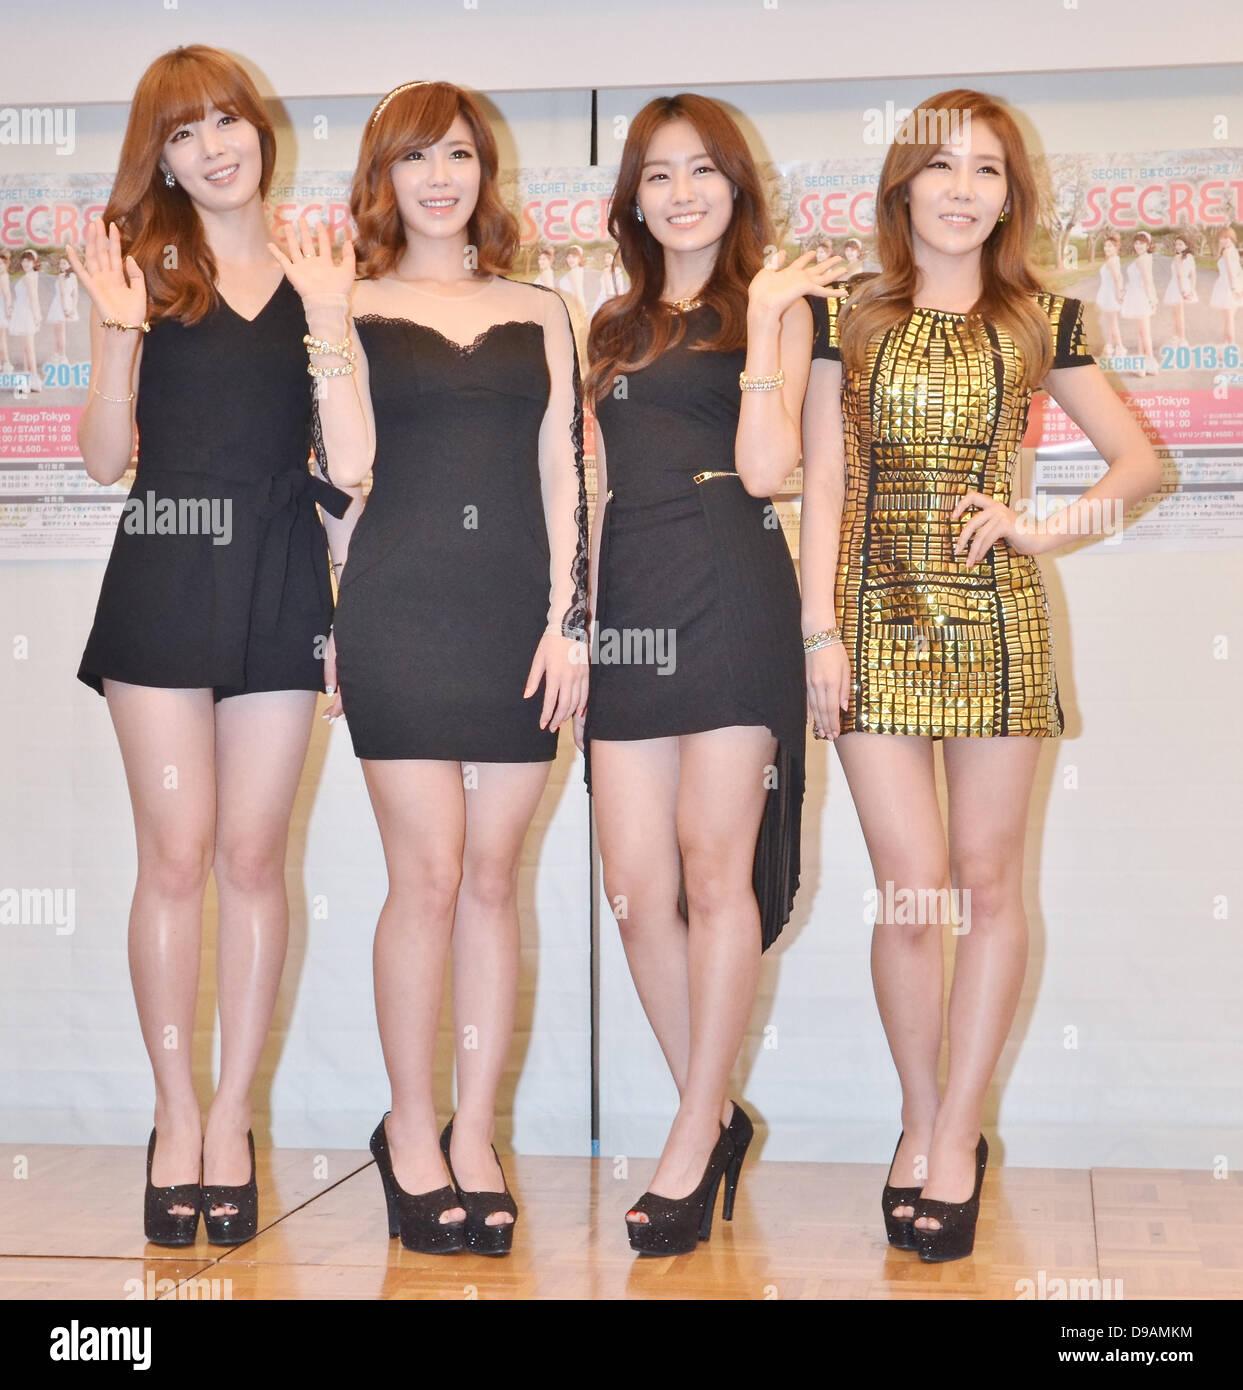 Secret, Jun 14, 2013: Tokyo, Japan: South Korean girl band ...